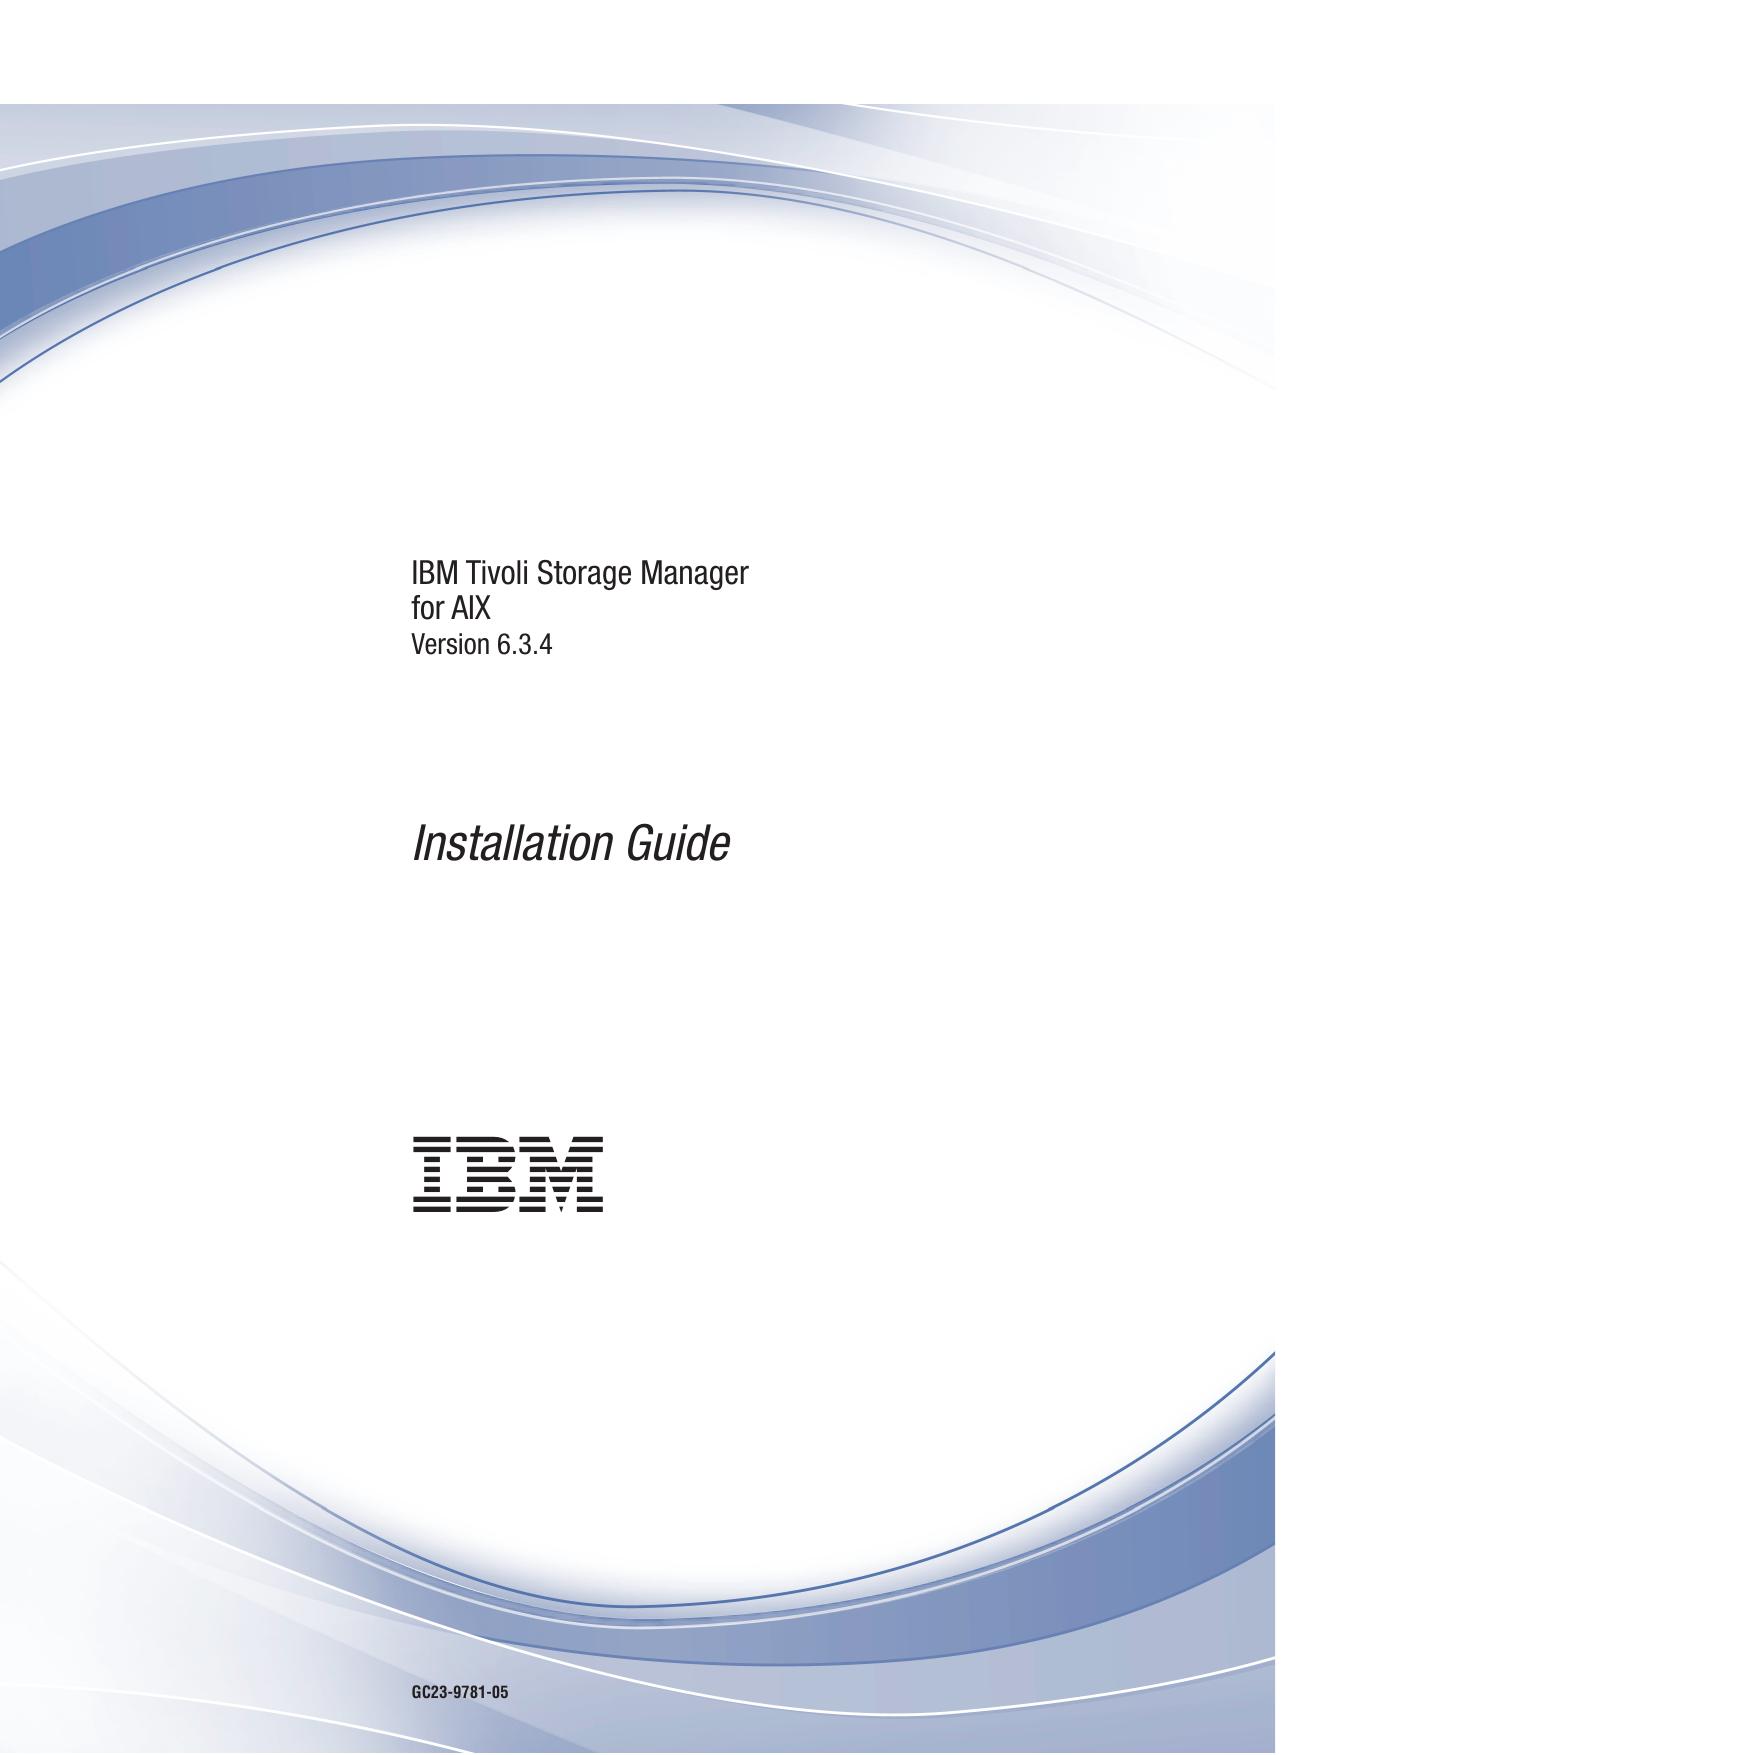 IBM Tivoli Storage Manager for AIX: Installation Guide